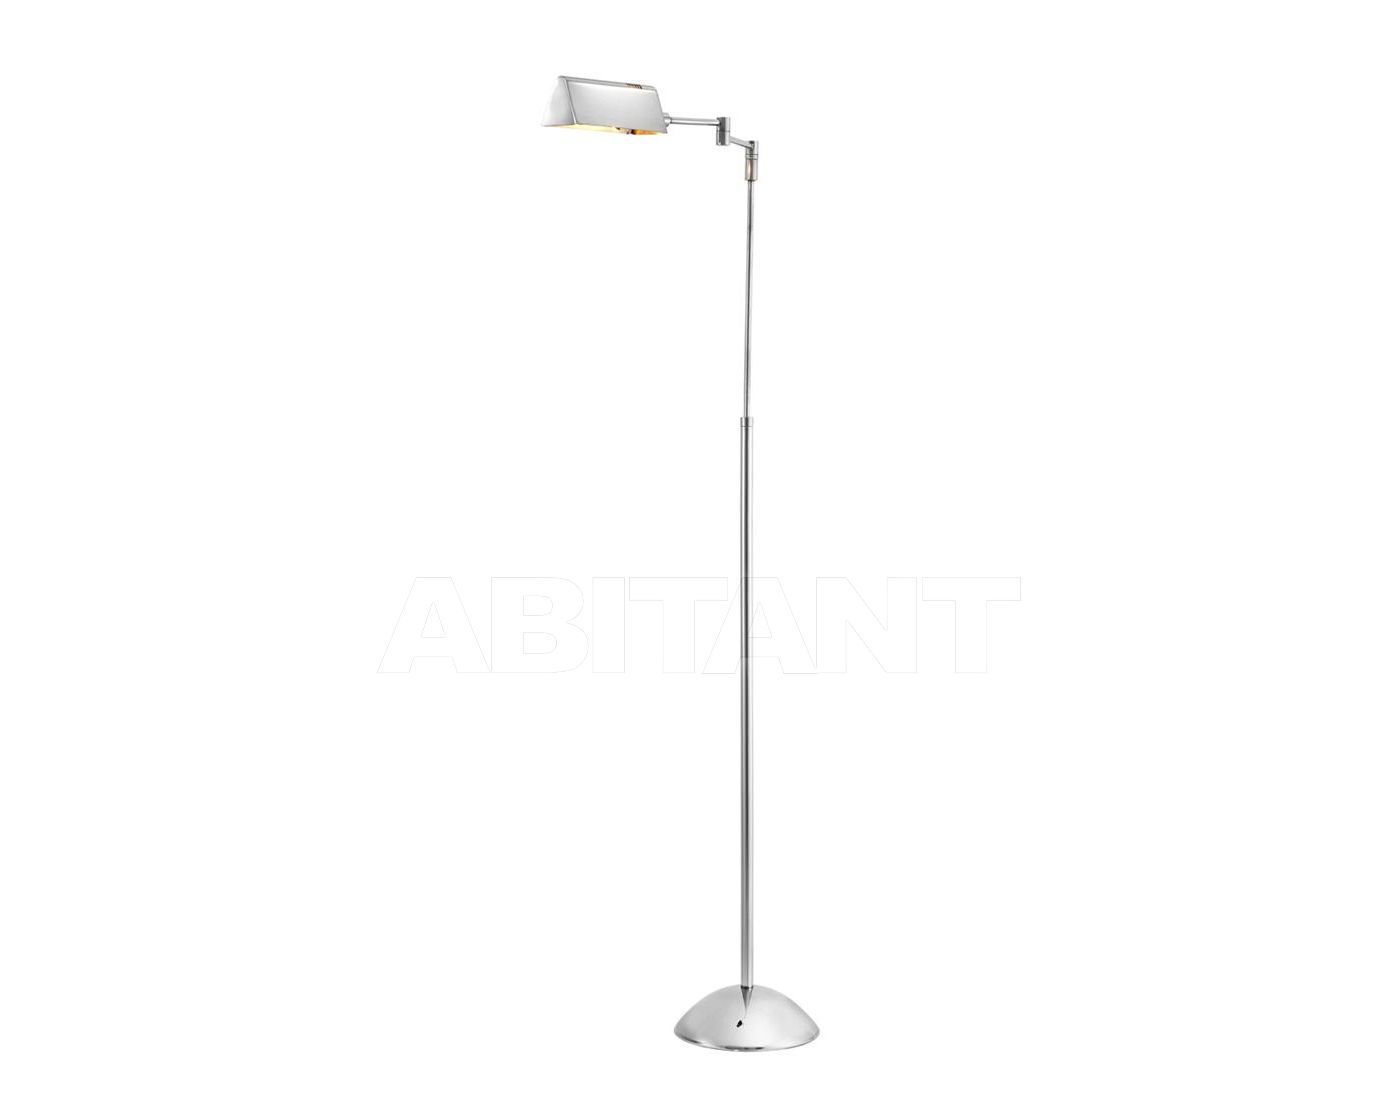 Купить Лампа напольная Moreau Eichholtz  Lighting 107568